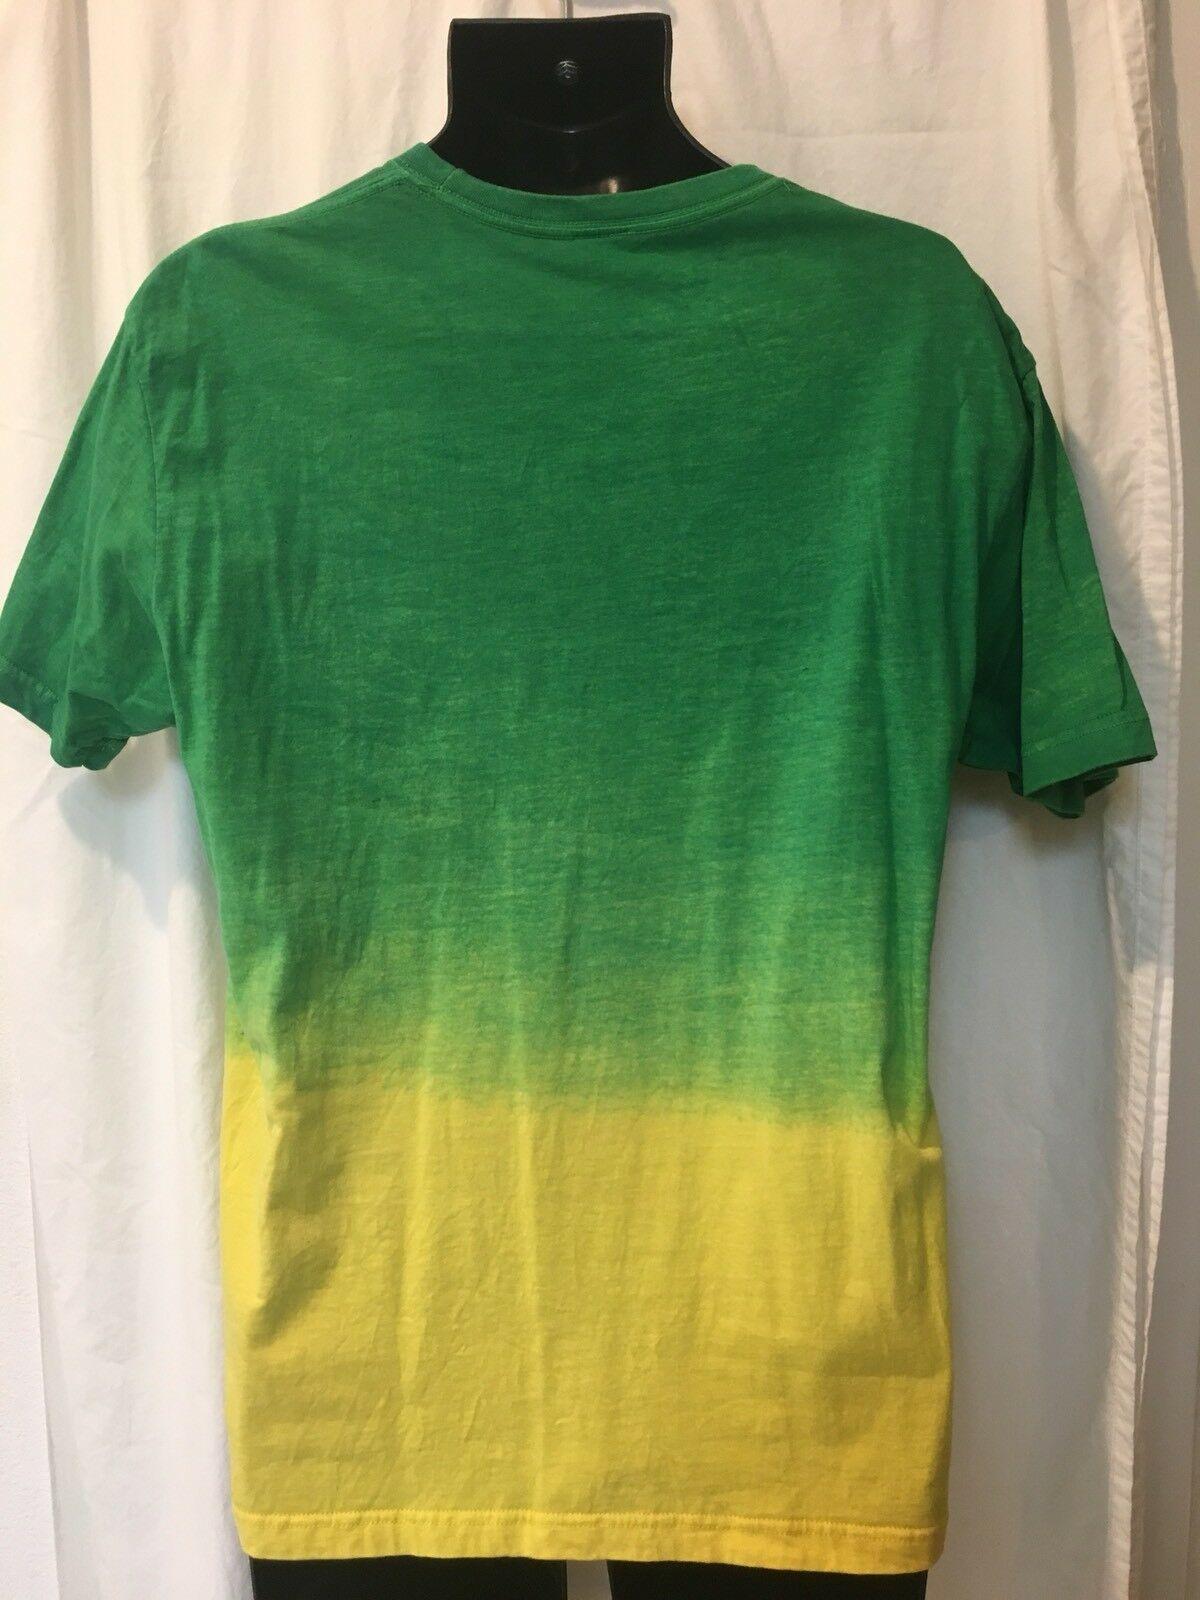 Rio 2016 Olympics Paixão Shirt M Tie dyed image 4